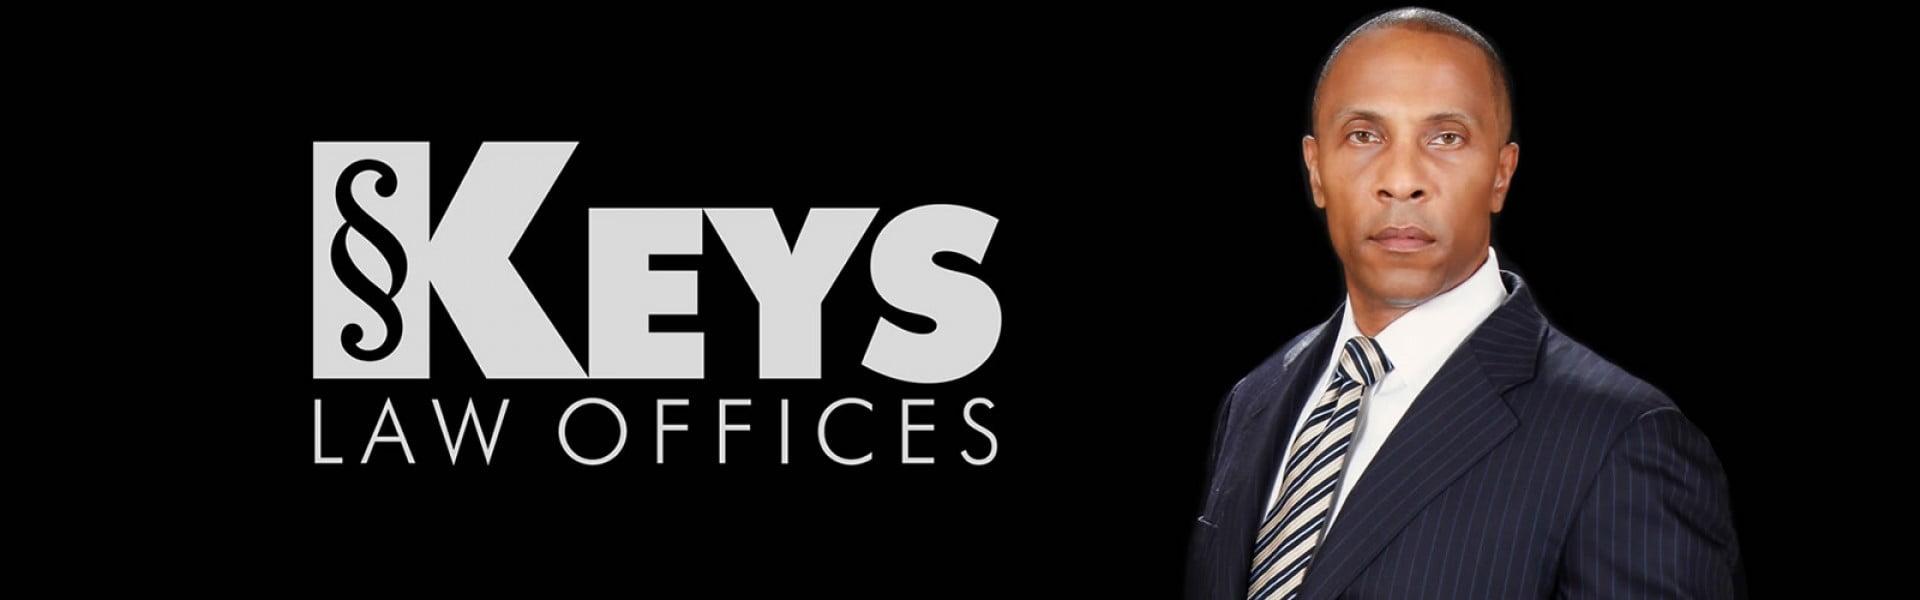 Attorney Rick Keys